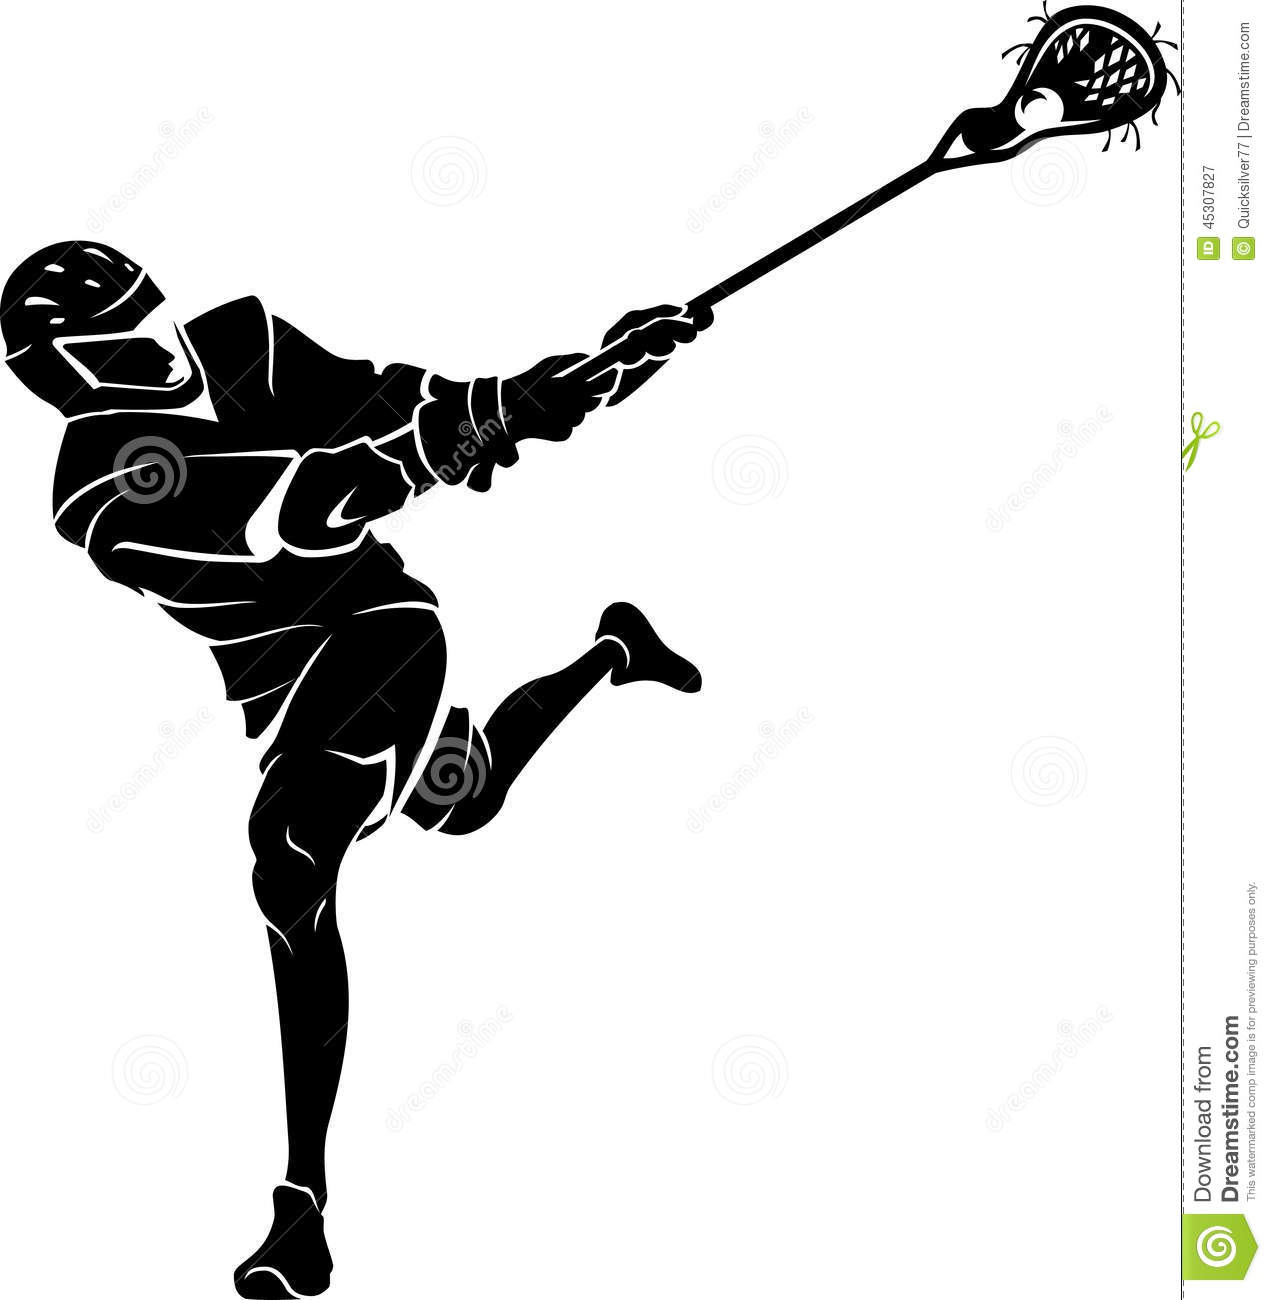 1271x1300 Lacrosse Silhouettes Clipart